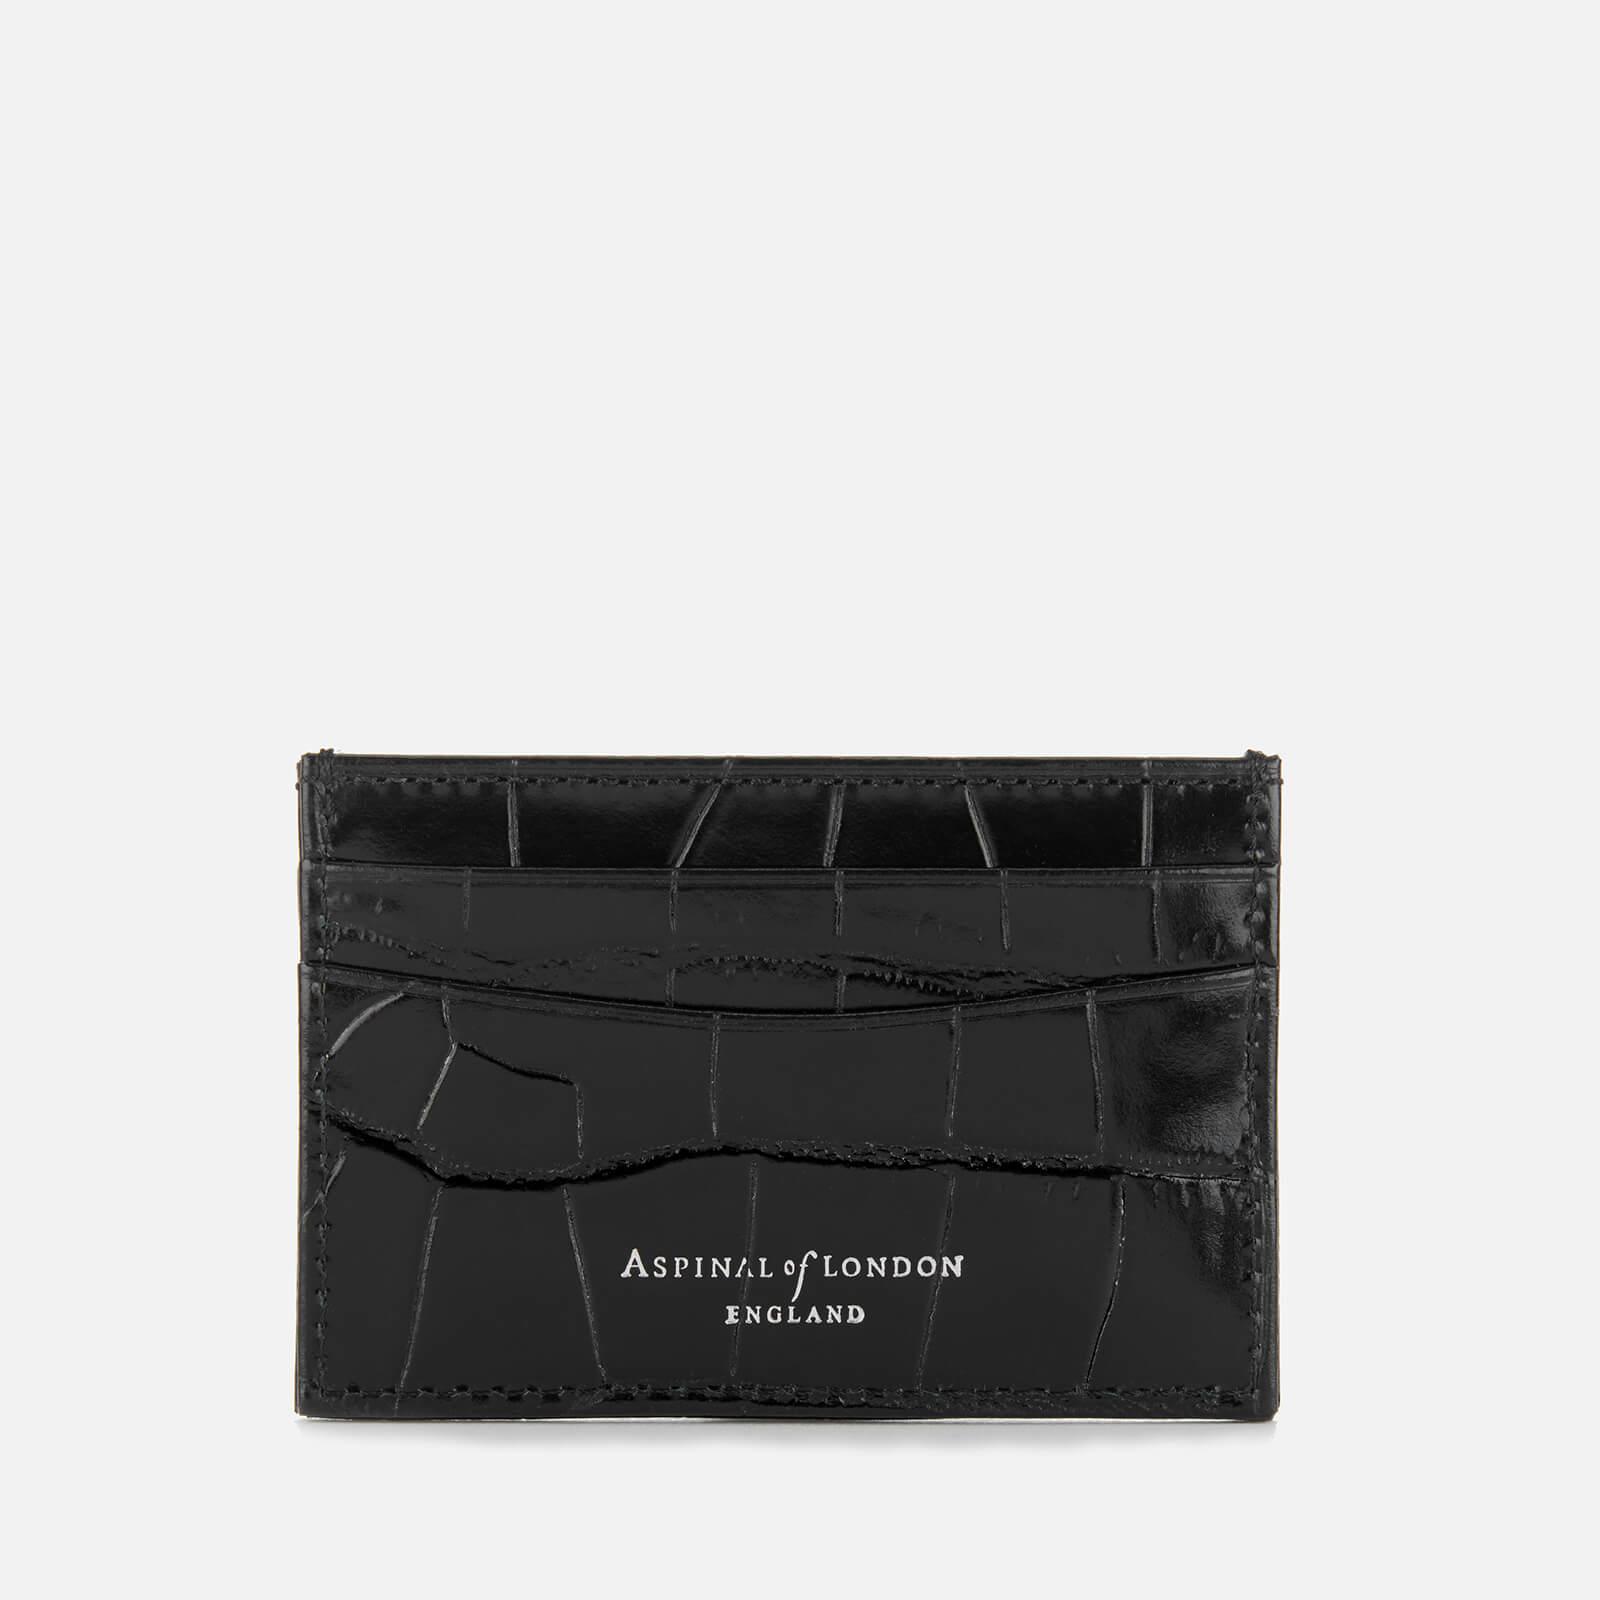 new concept 97e0c 3d8ad Aspinal of London Women's Slim Croc Credit Card Case - Black